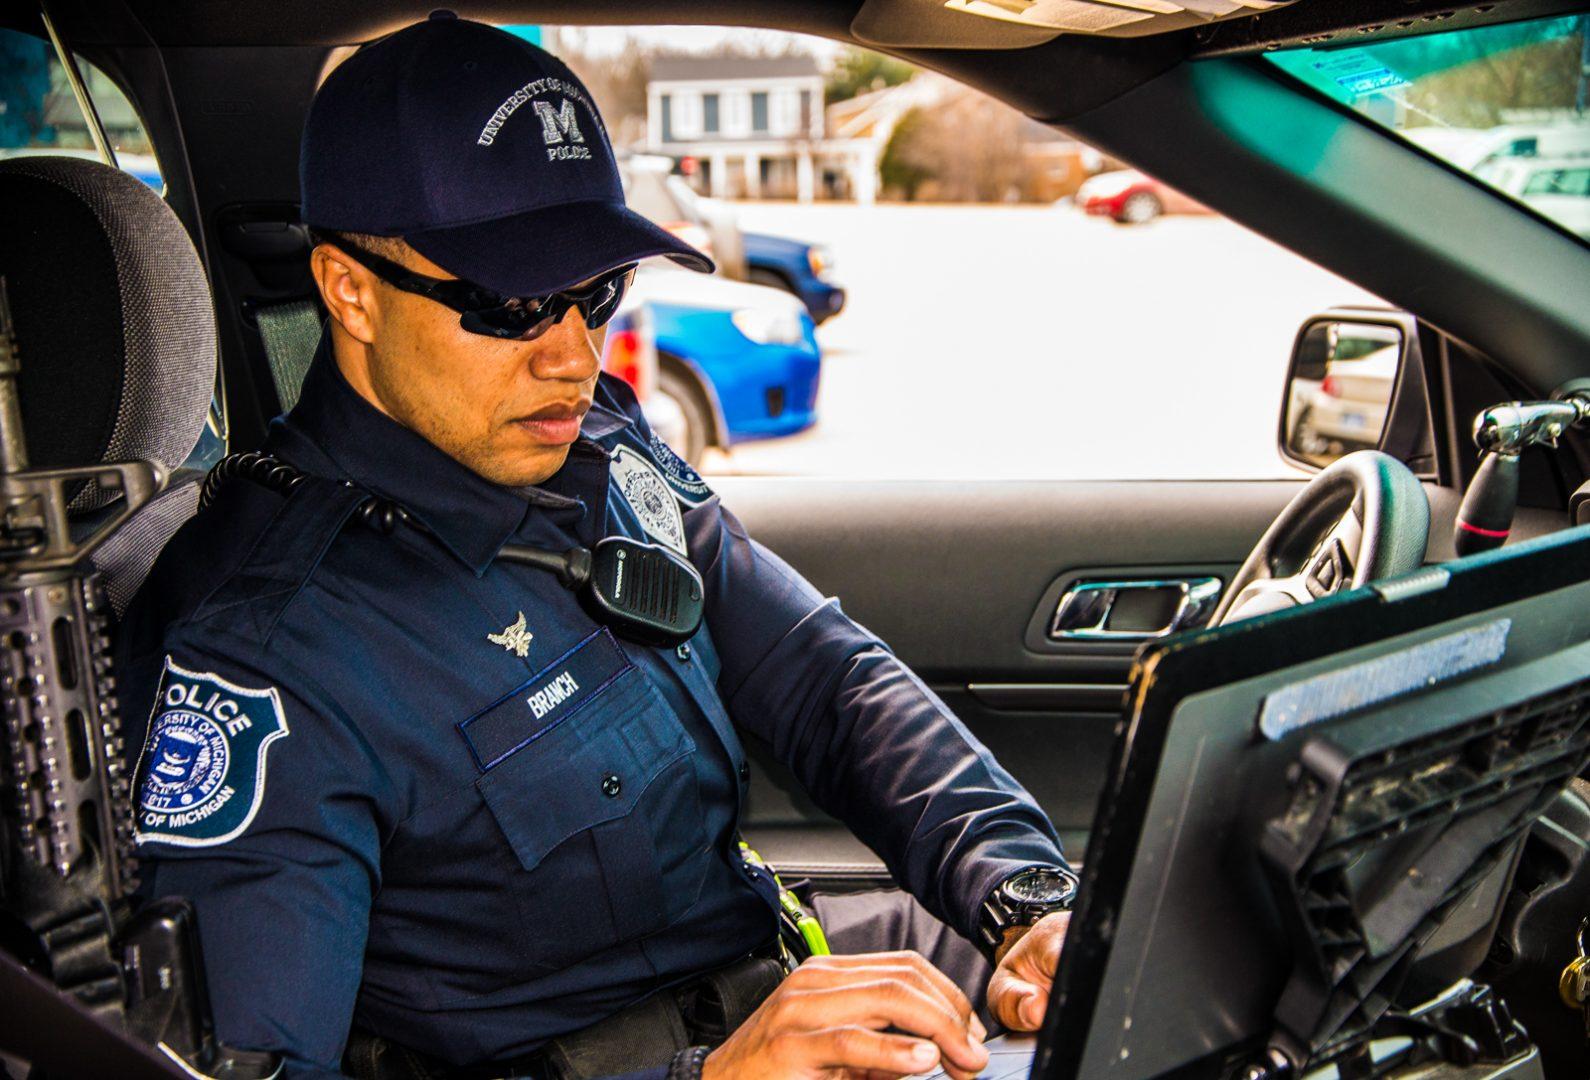 Officer John-Mark Branch